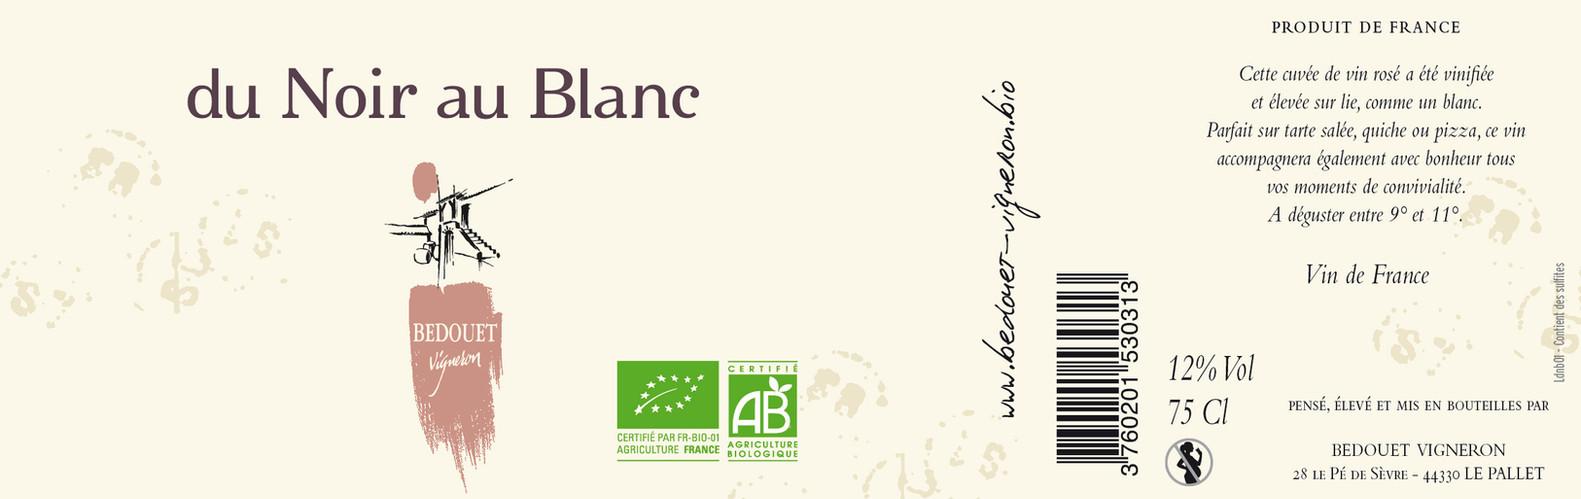 Du Noir au Blanc Gamay Bedouet vigneron BIO